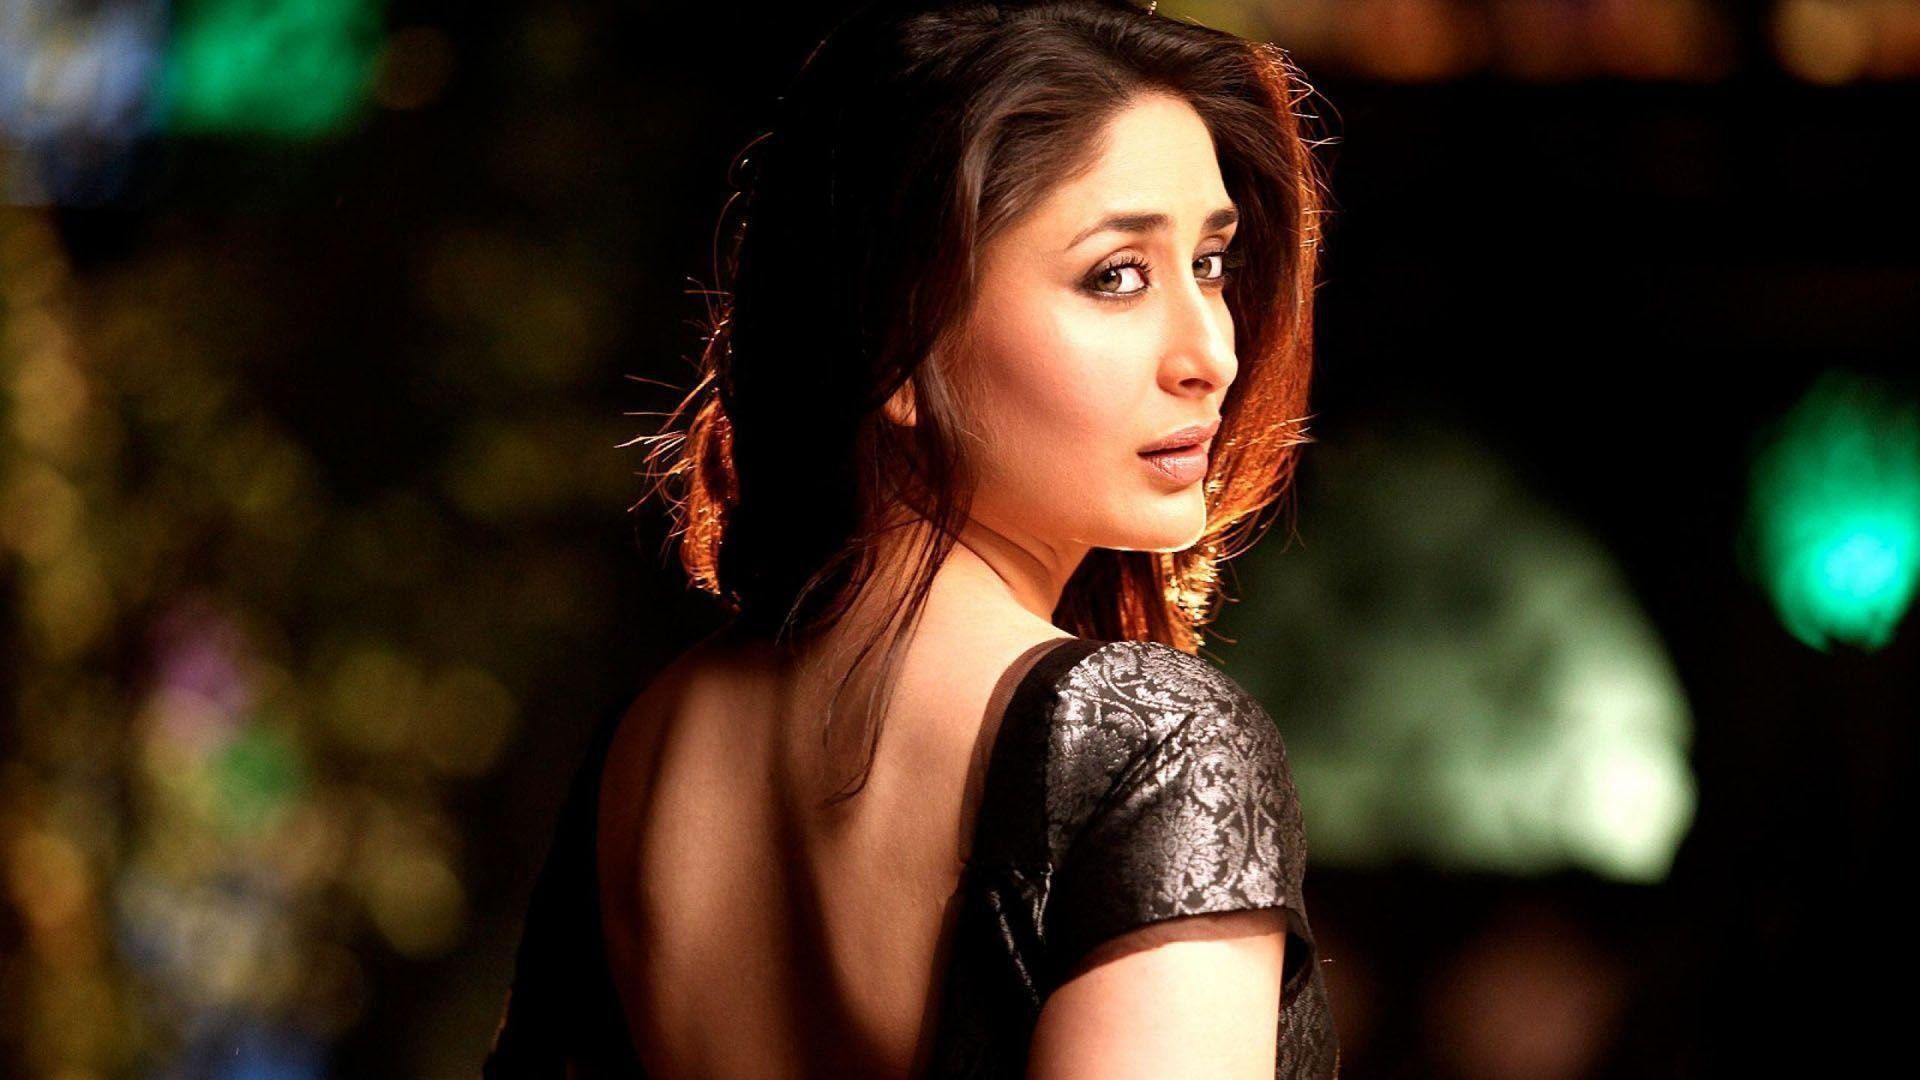 Bollywood Actress In Saree Full Hd Wallpapers Kumpulan Contoh Soal 7